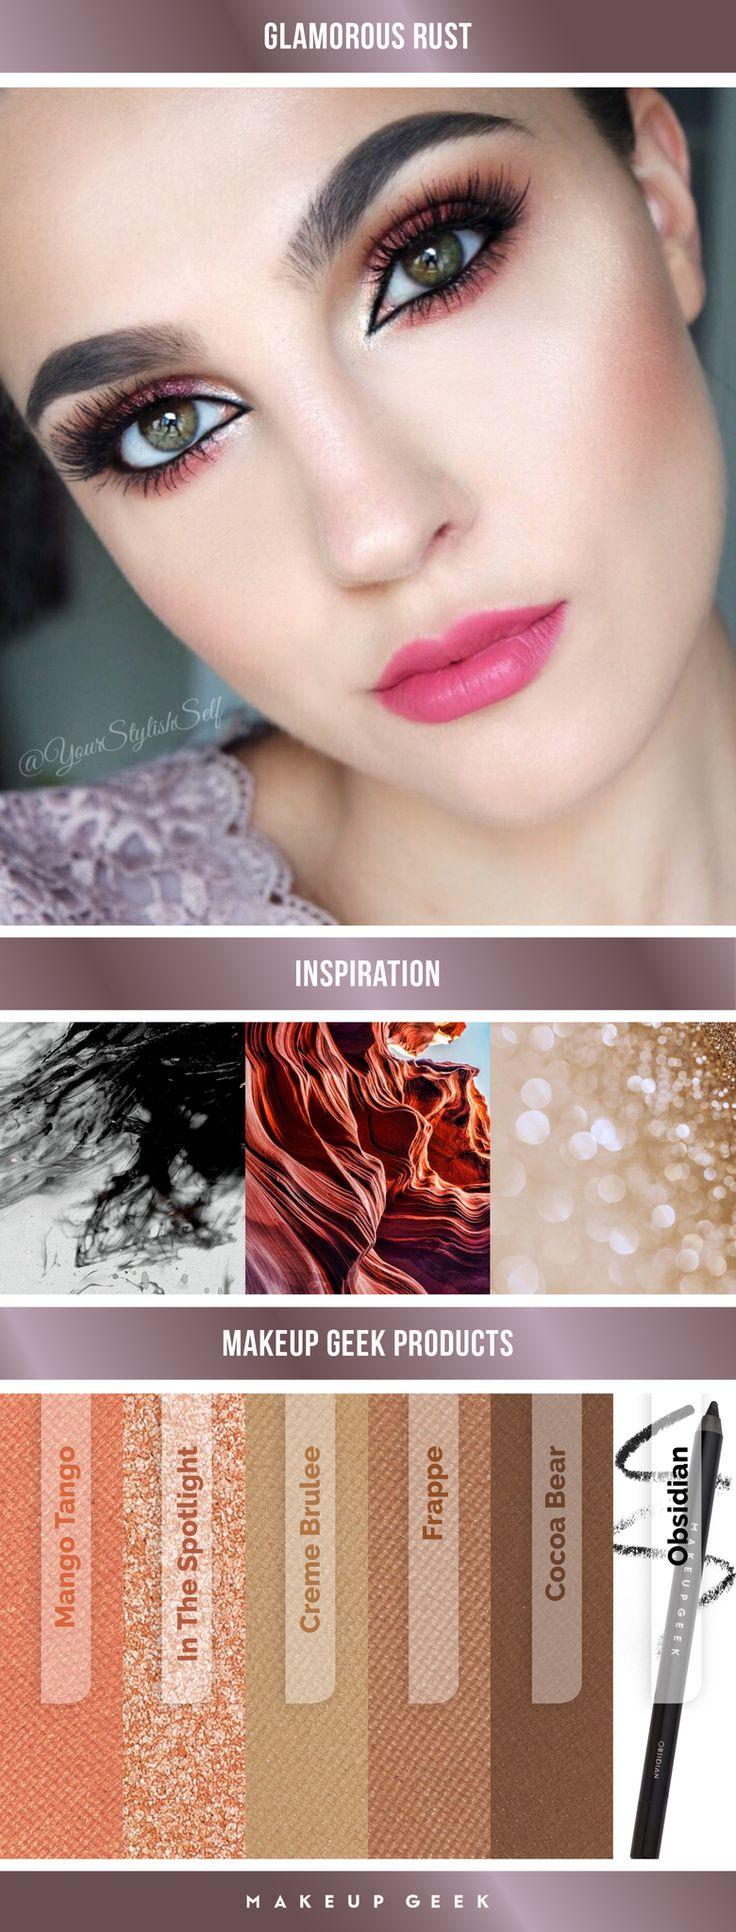 Grand glamour makeup tutorial